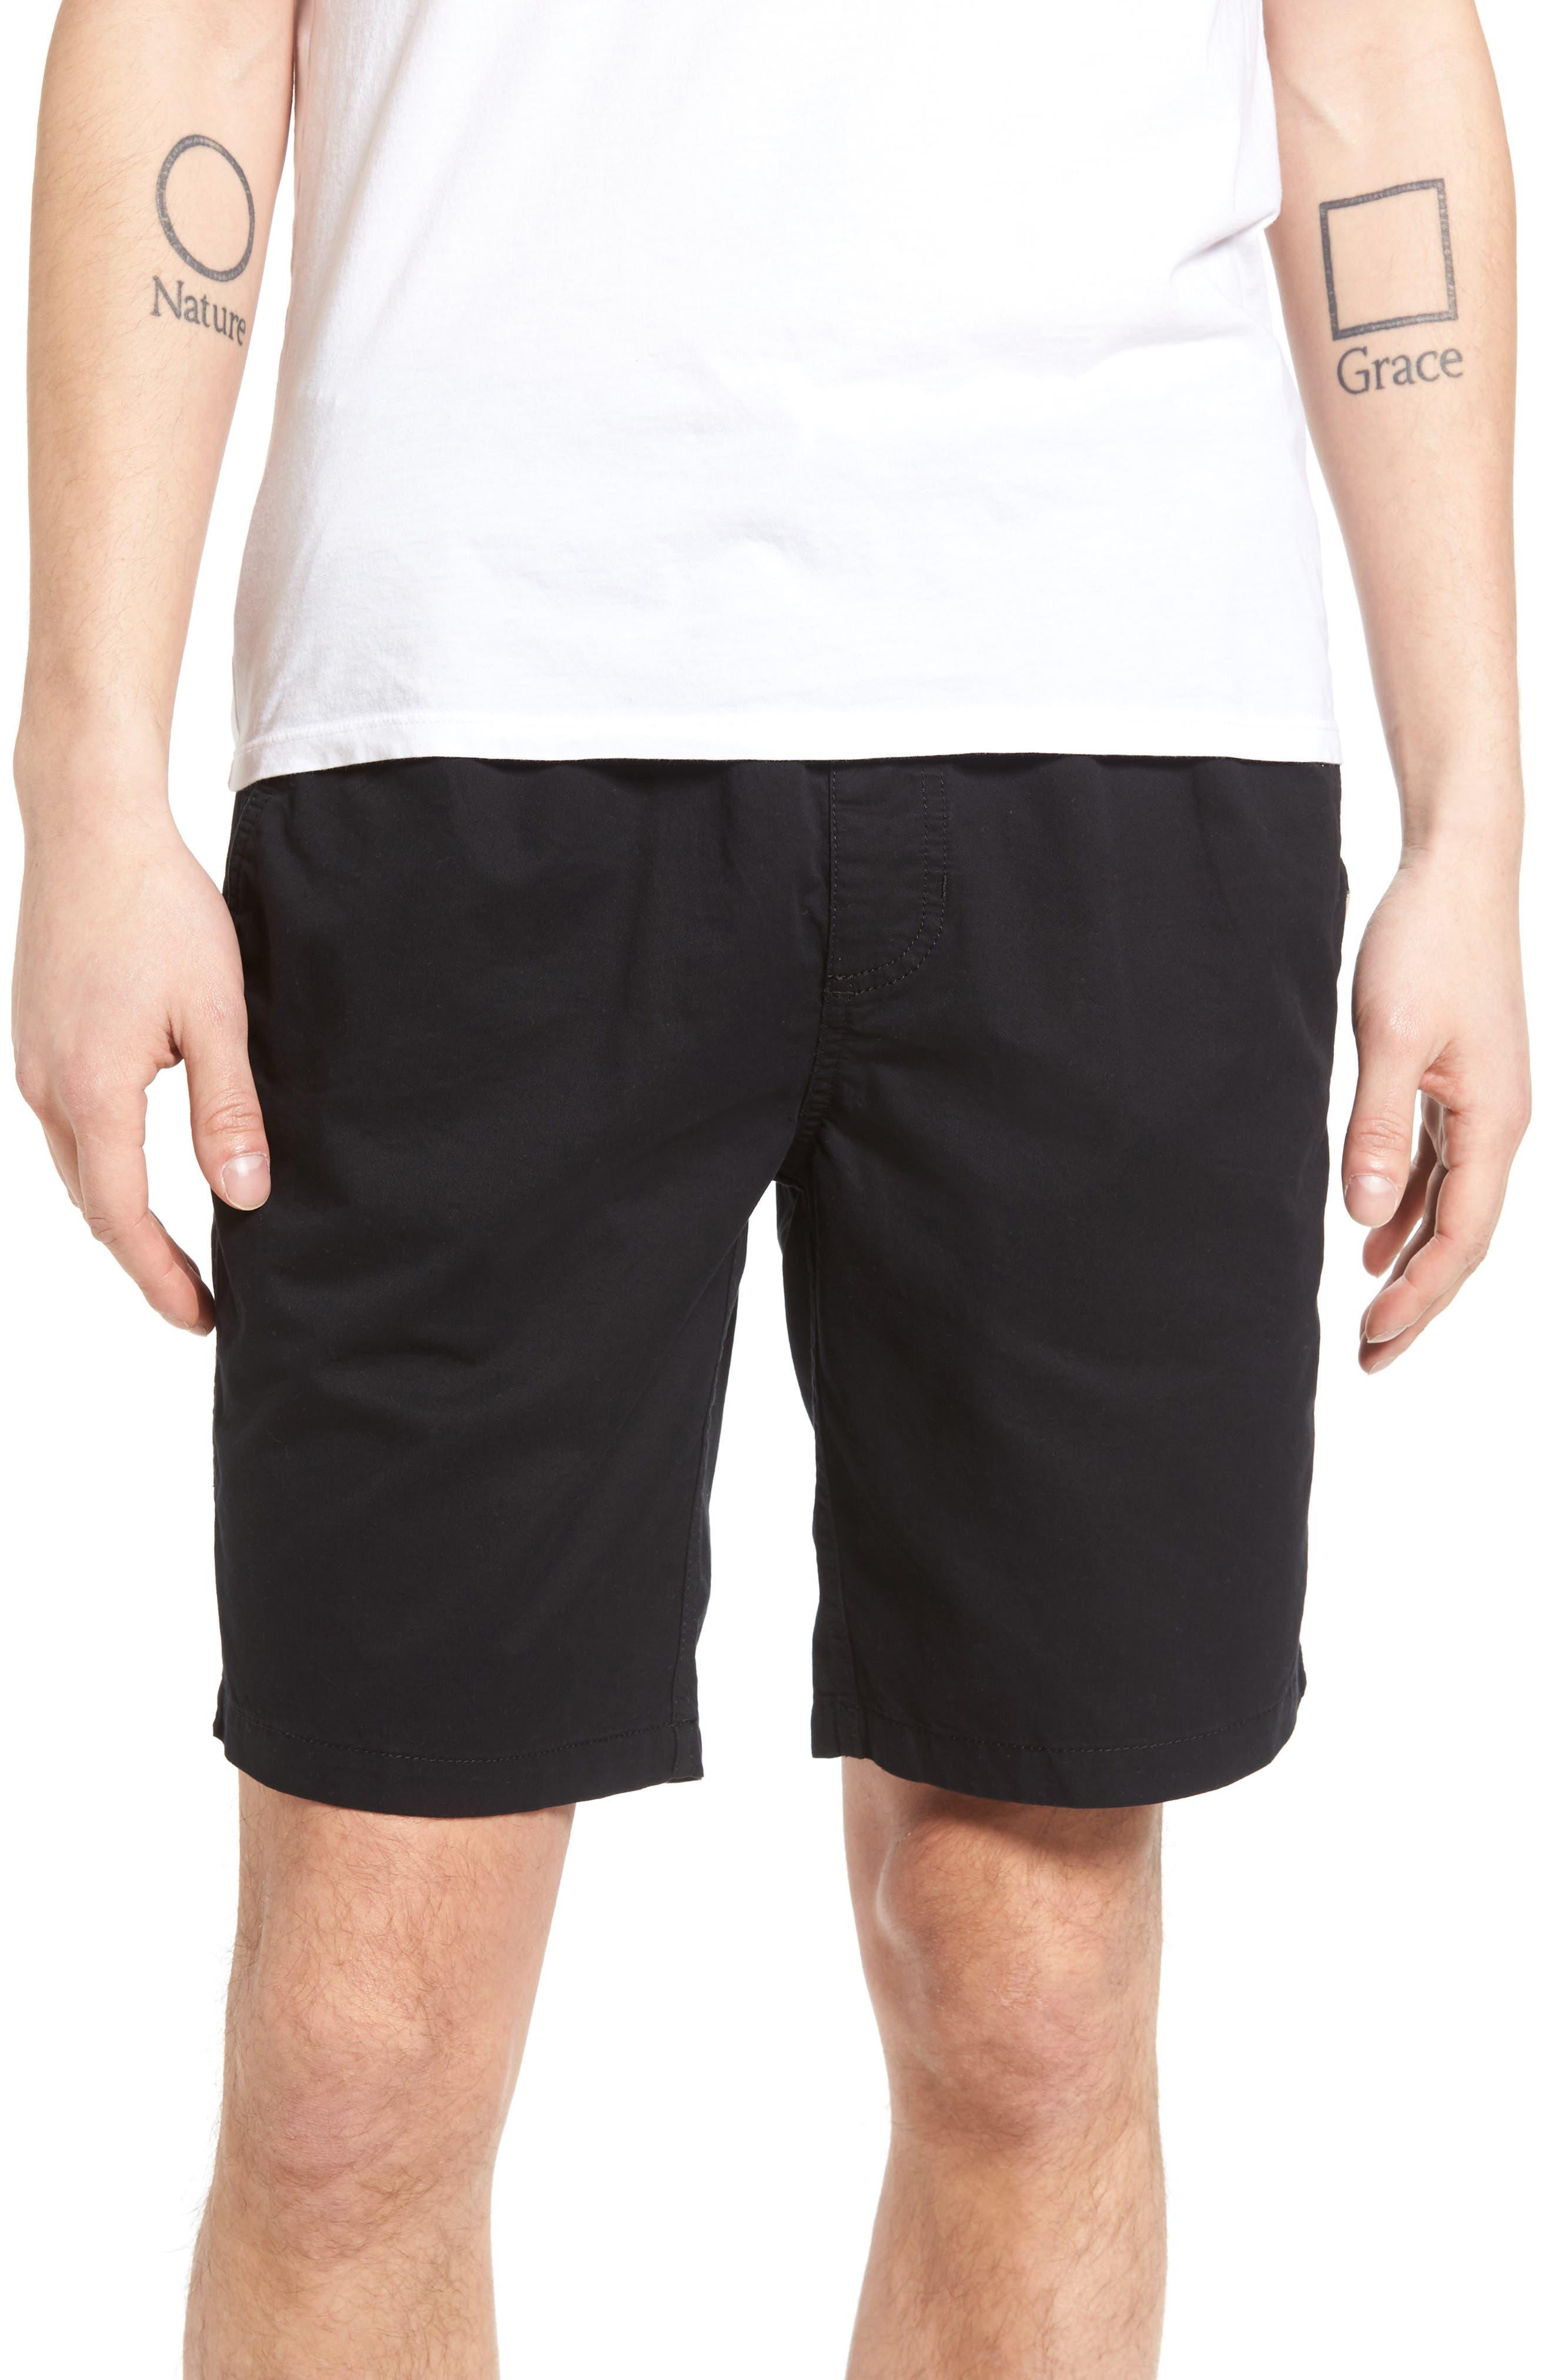 Range Shorts,                             Main thumbnail 1, color,